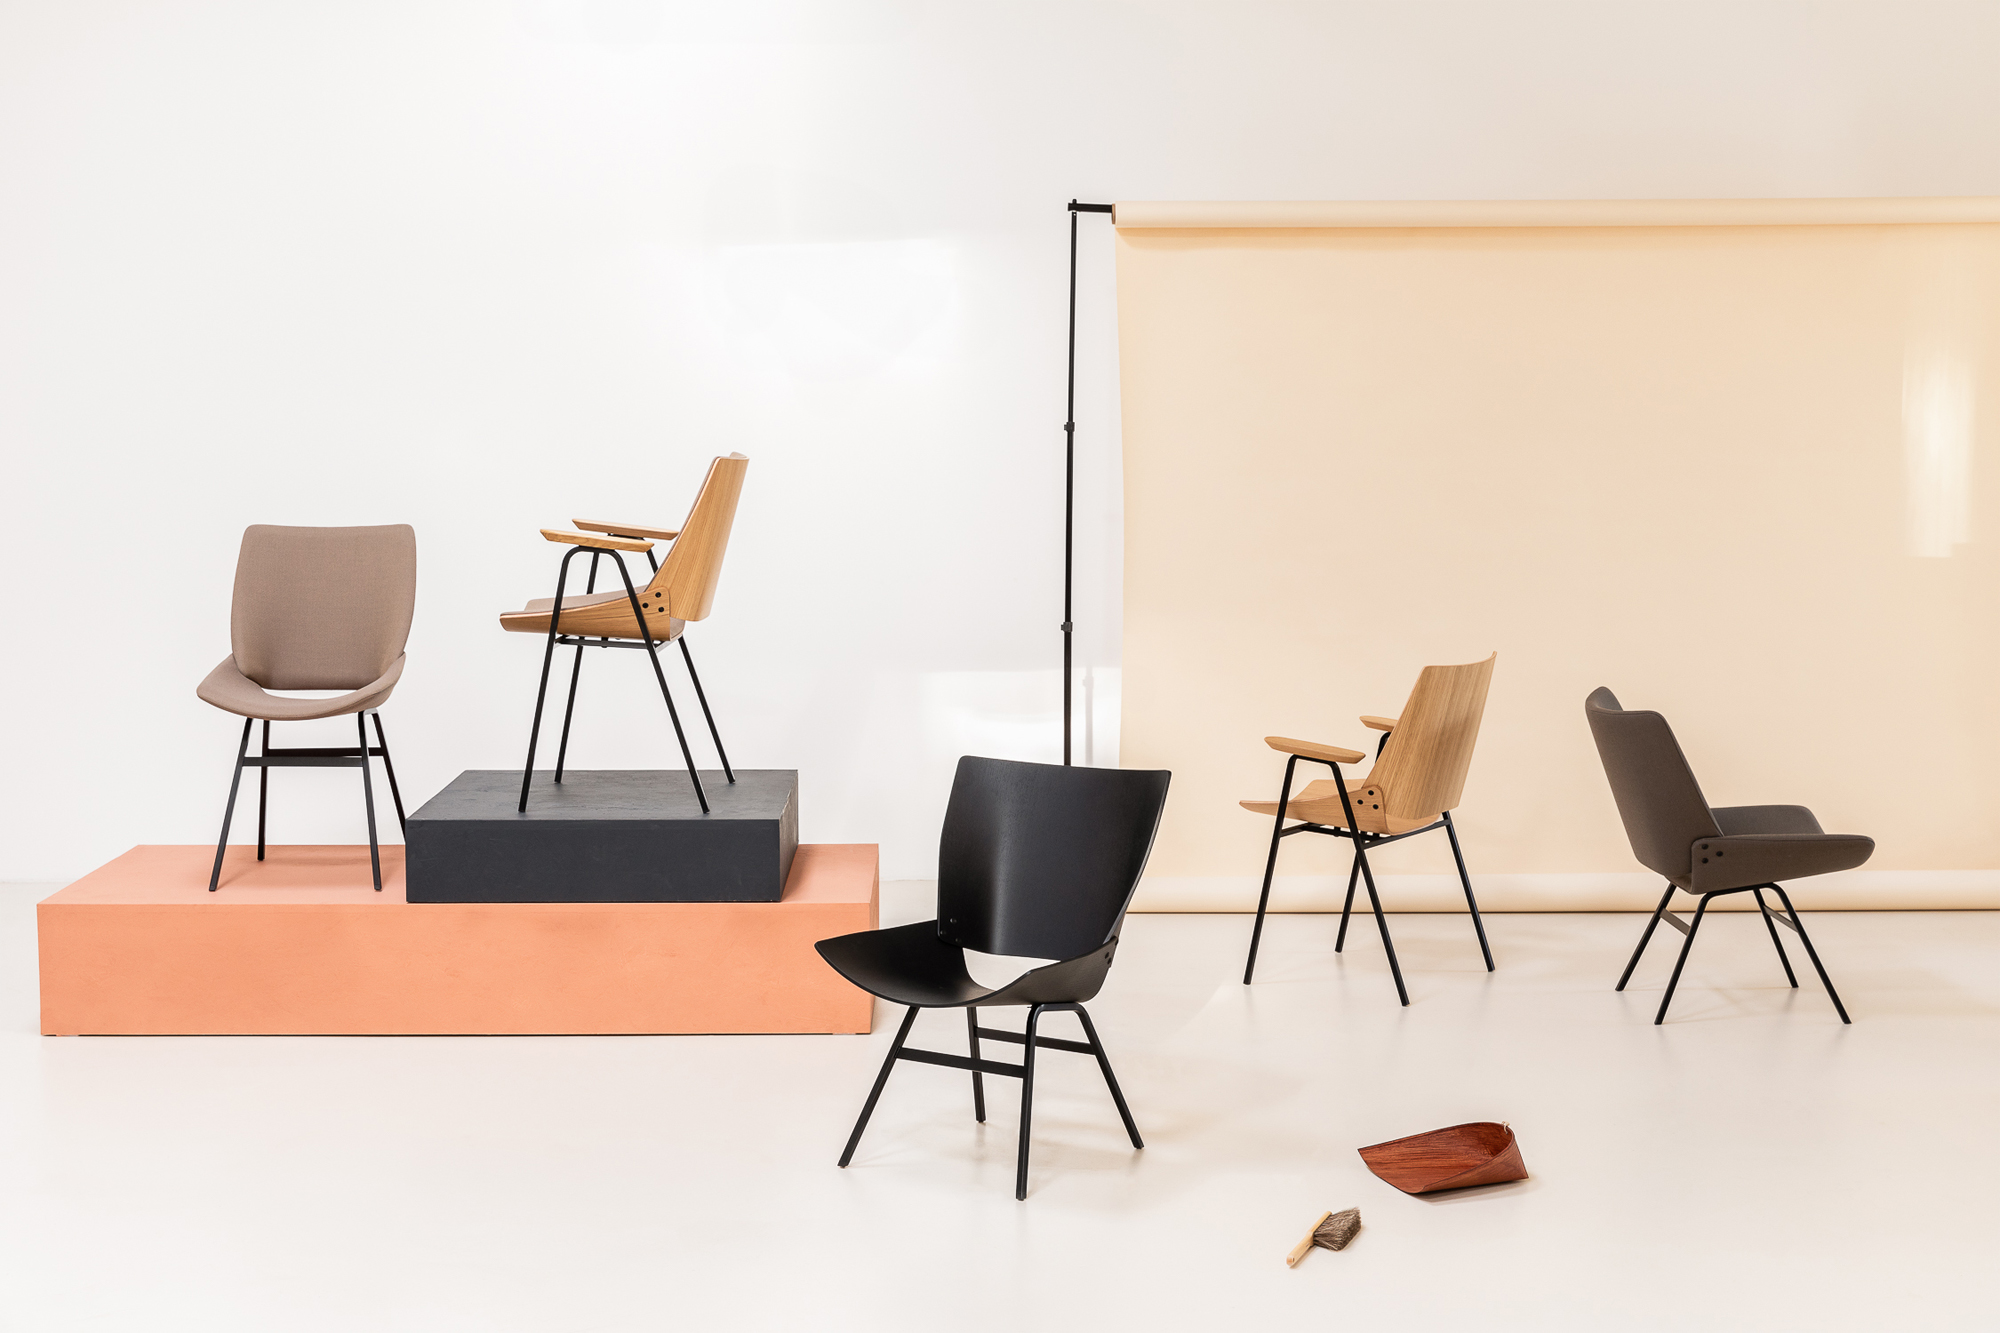 Niko Kralj 'Shell' Chair Range Image Credit: Rex Kralj